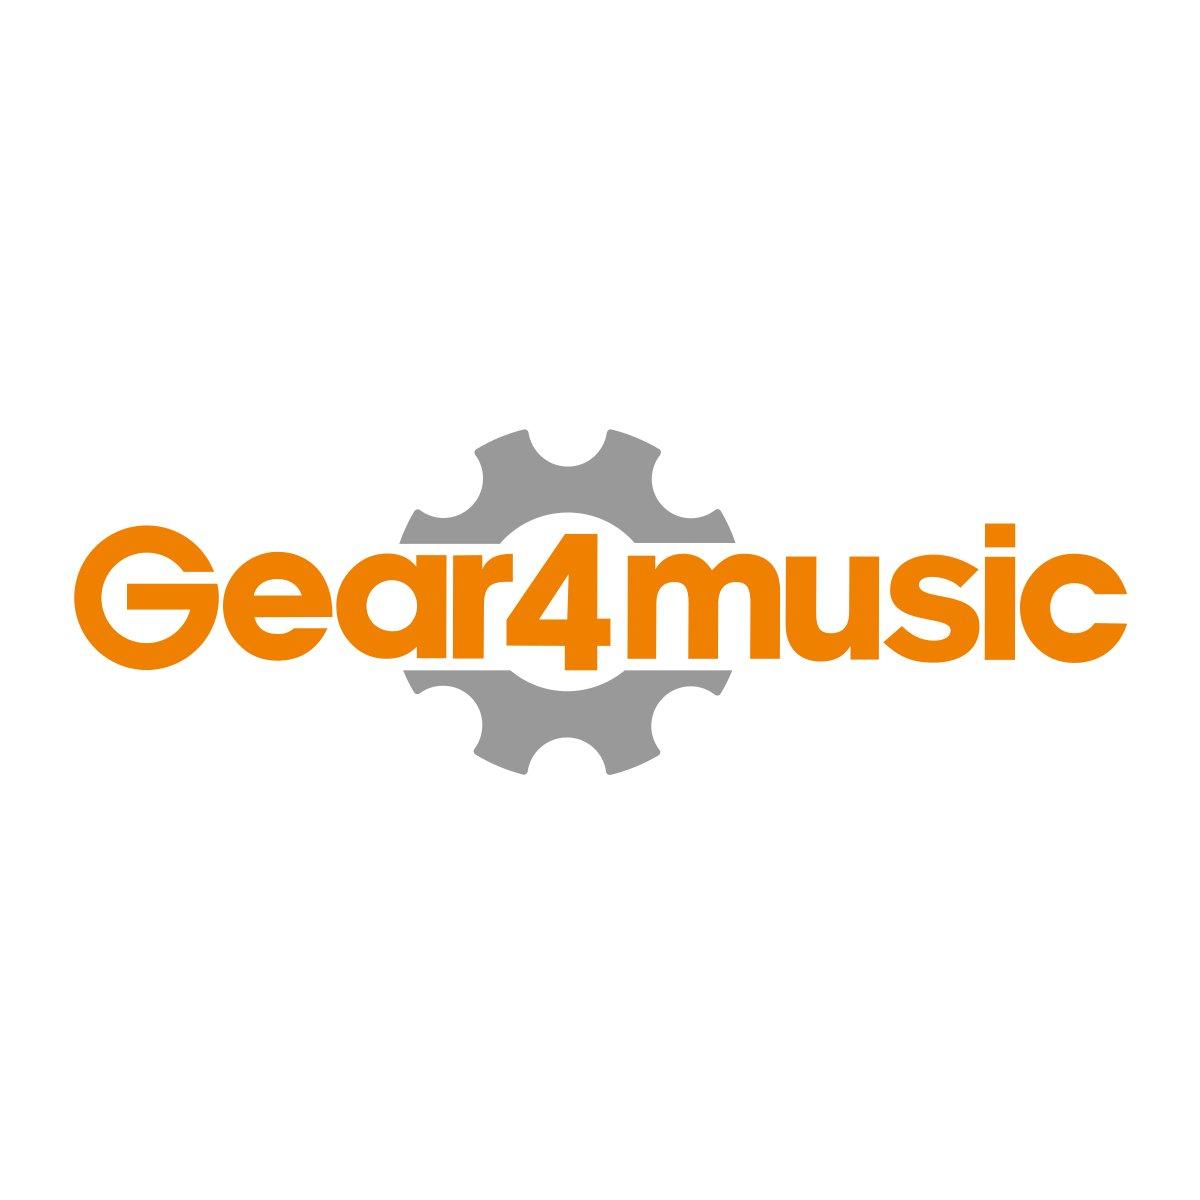 Heavy Duty dwóch nóg    Hi-Hat Stand marki Gear4music - B-stock